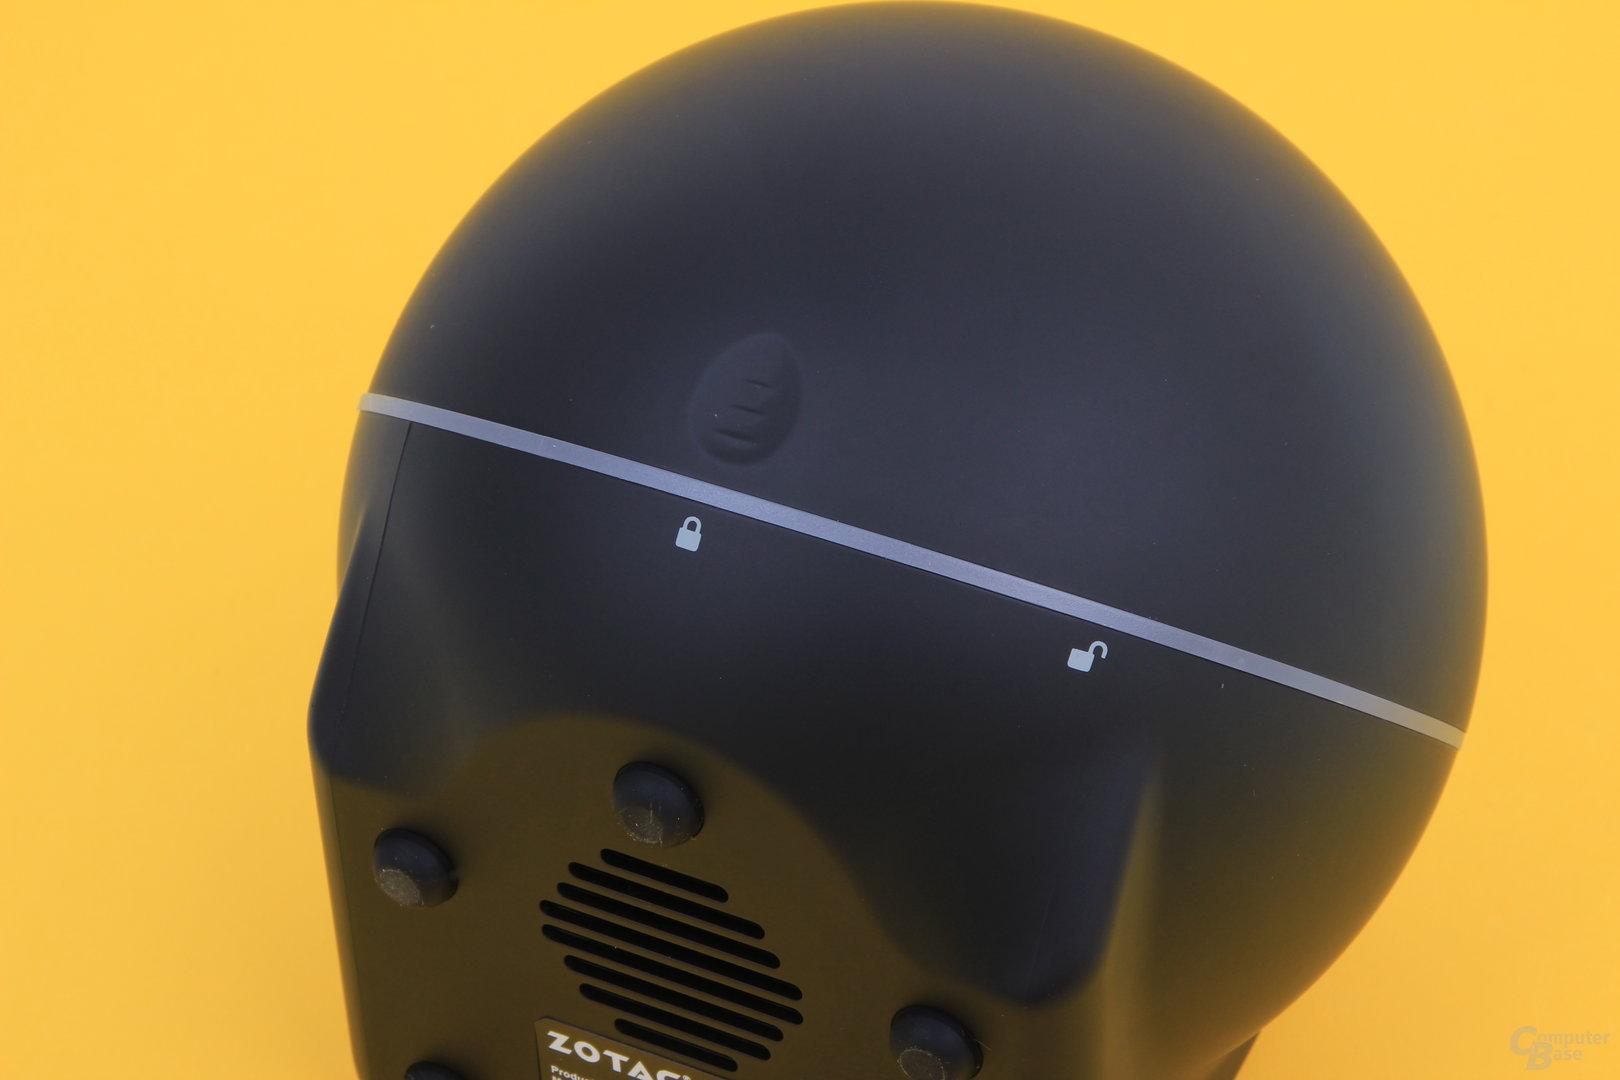 Zotac Zbox Sphere OI520 – drehbarer Deckel